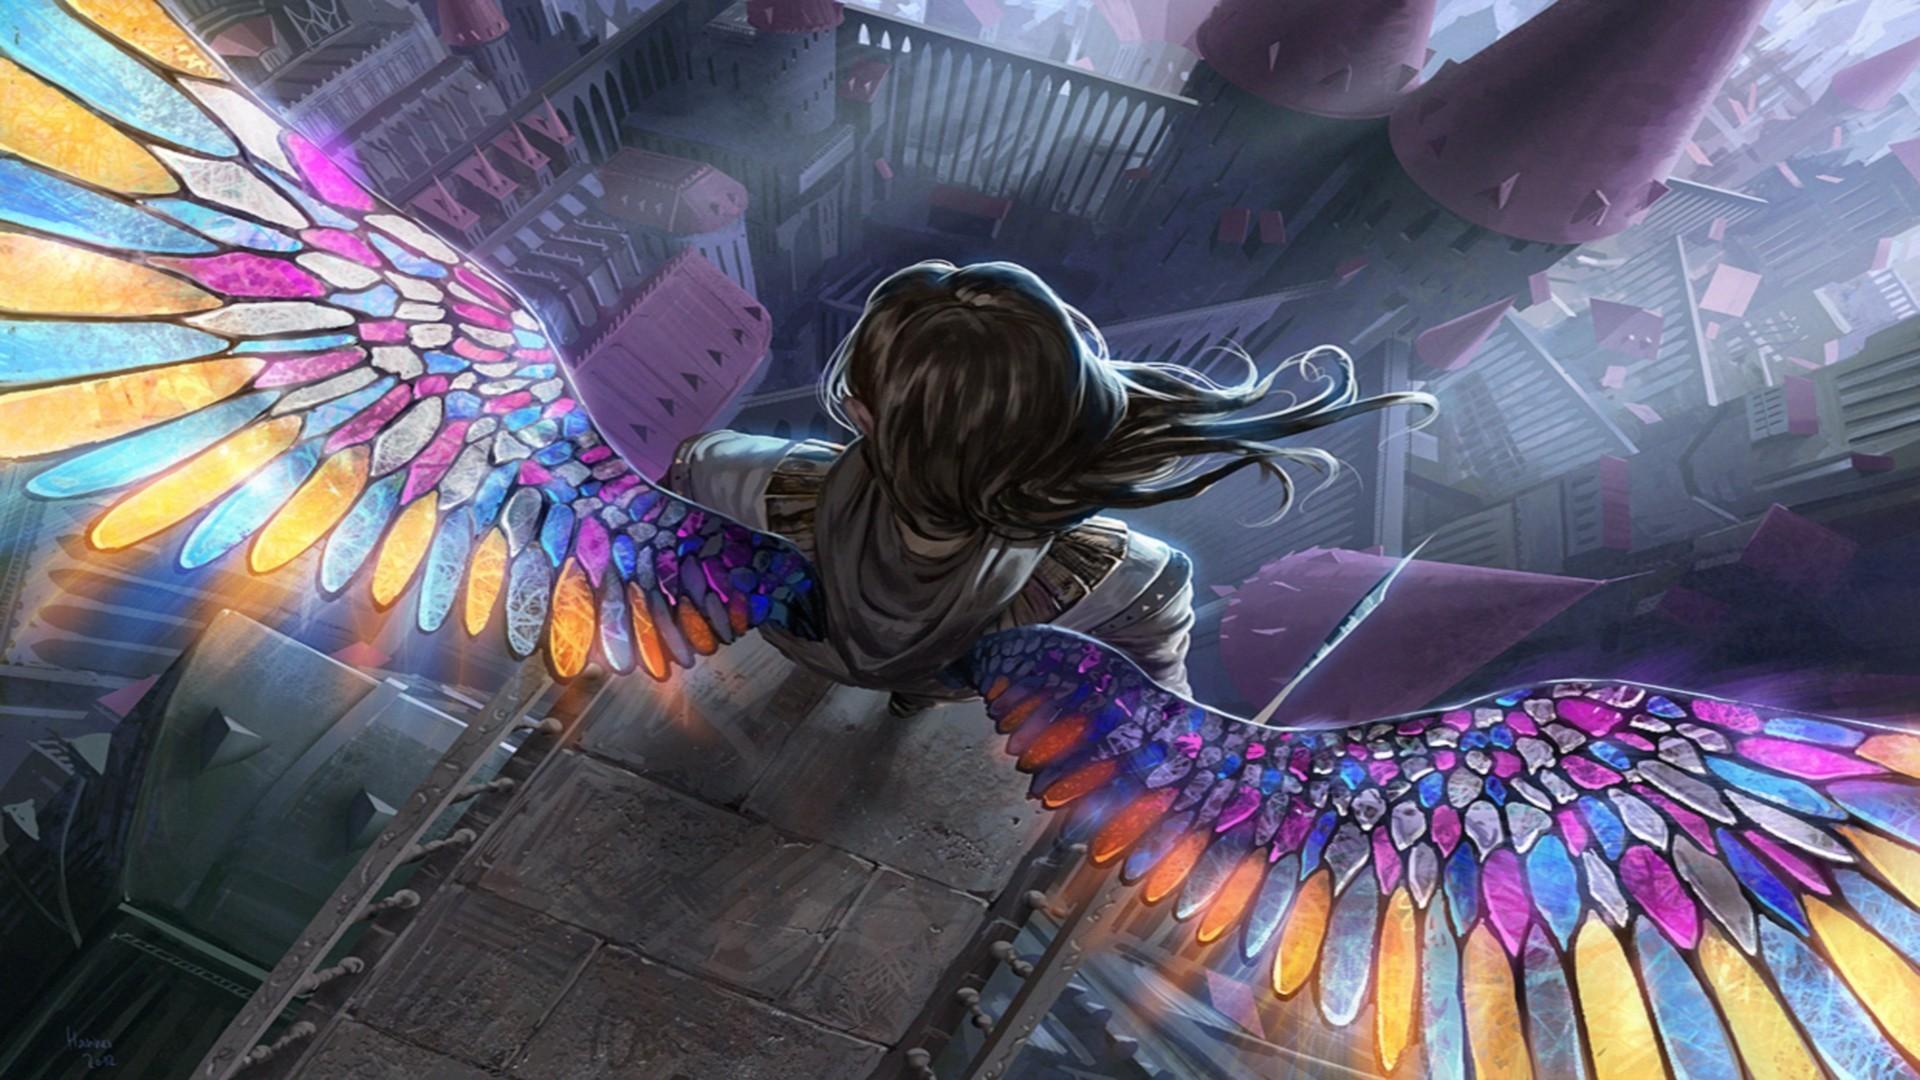 Angel Magic The Gathering Fantasy Art Download Wallpaper